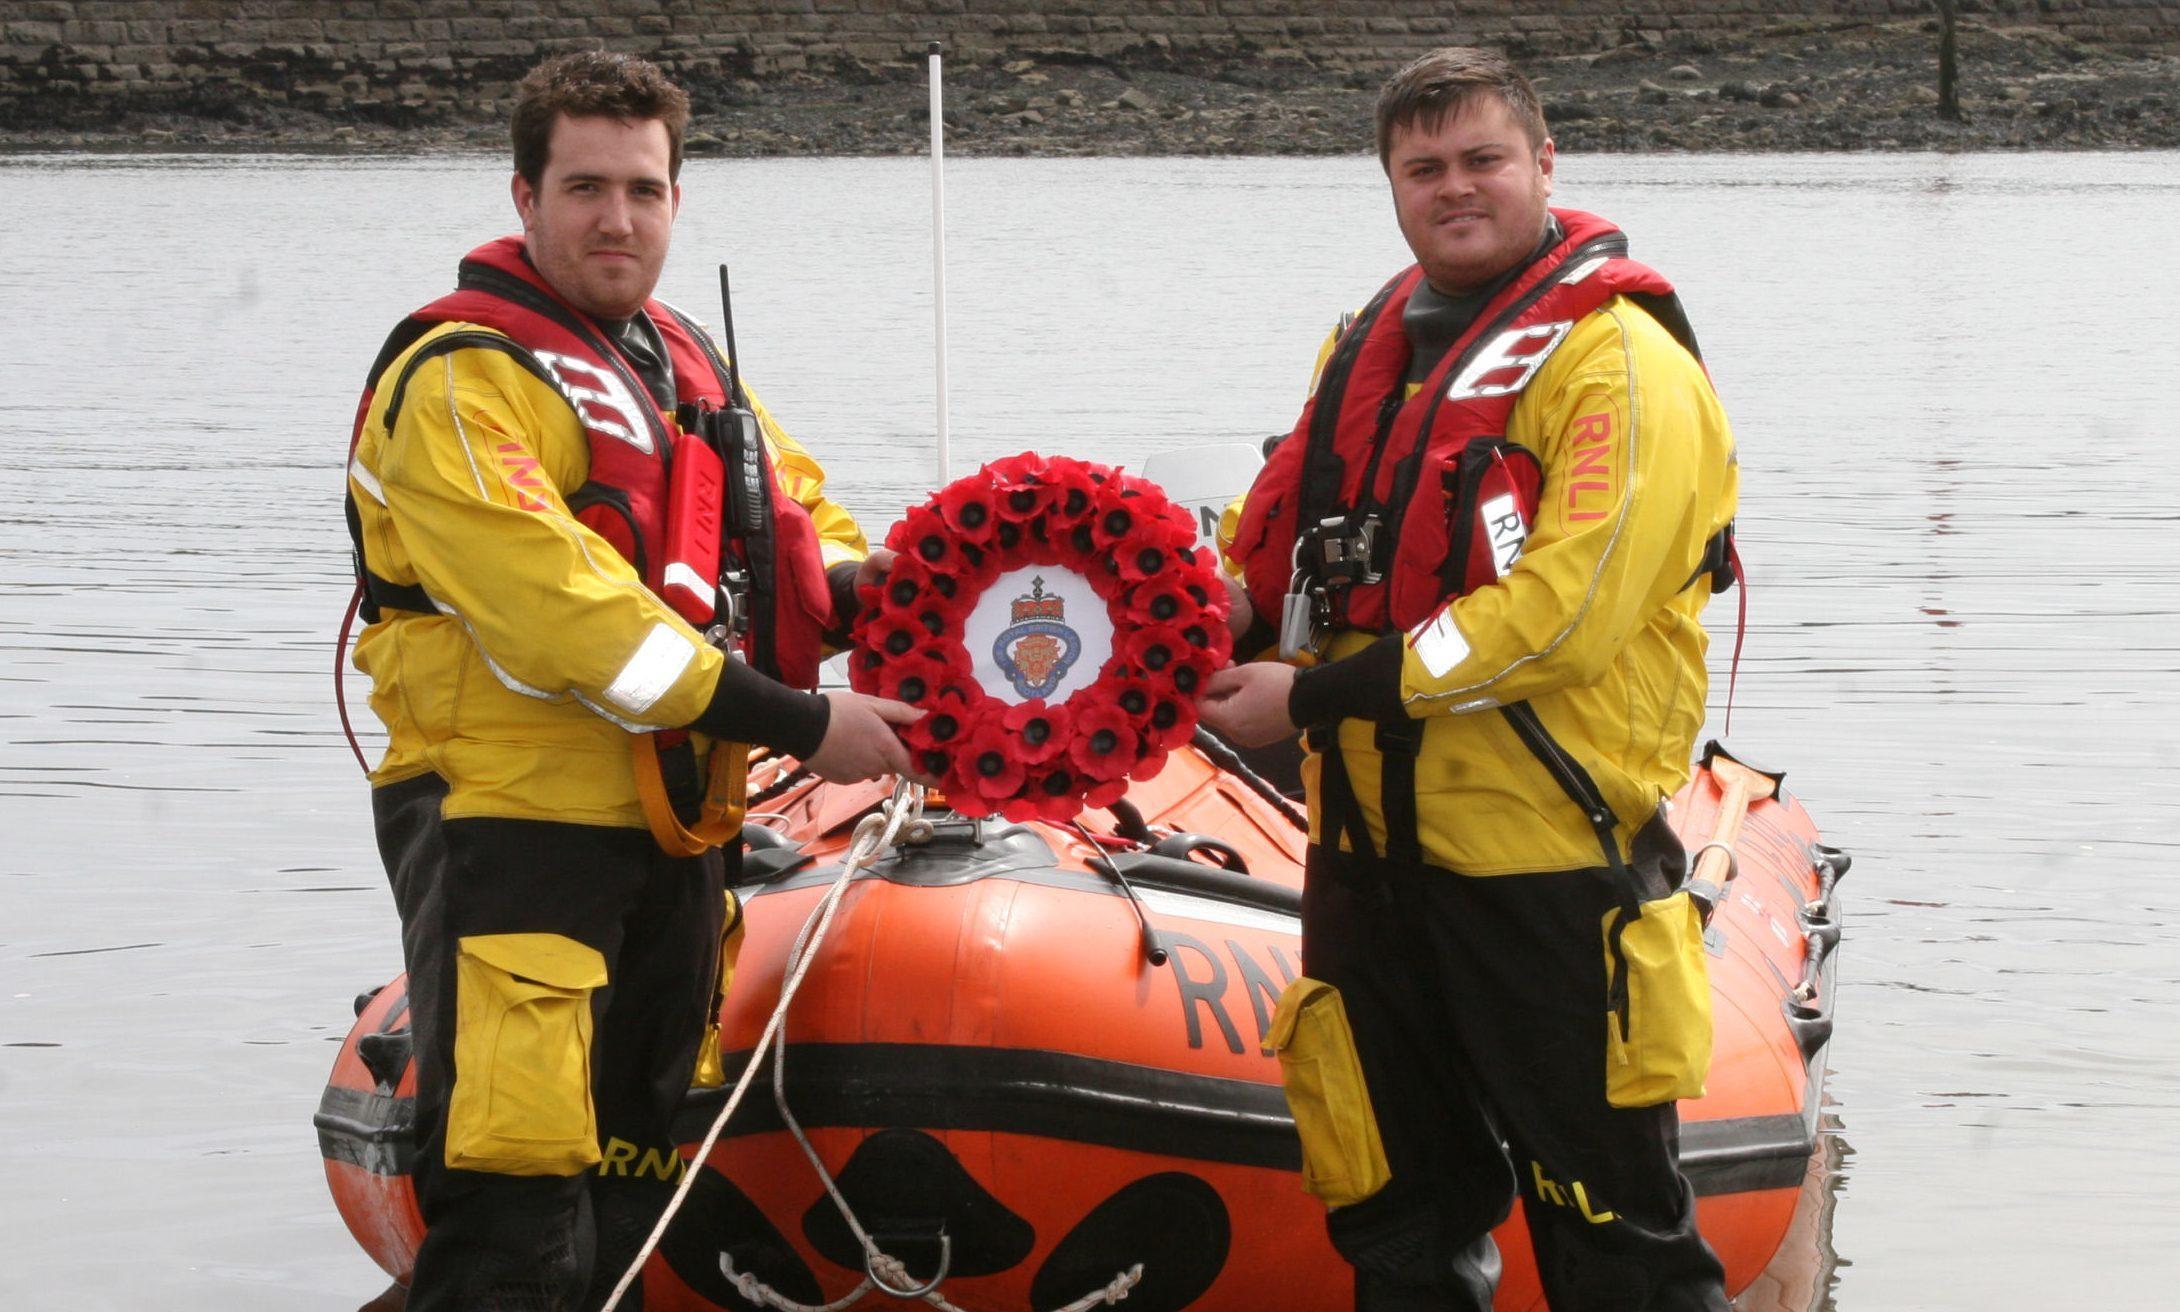 Arbroath RNLI crewmen Michael Marr and Jamie Robertson.